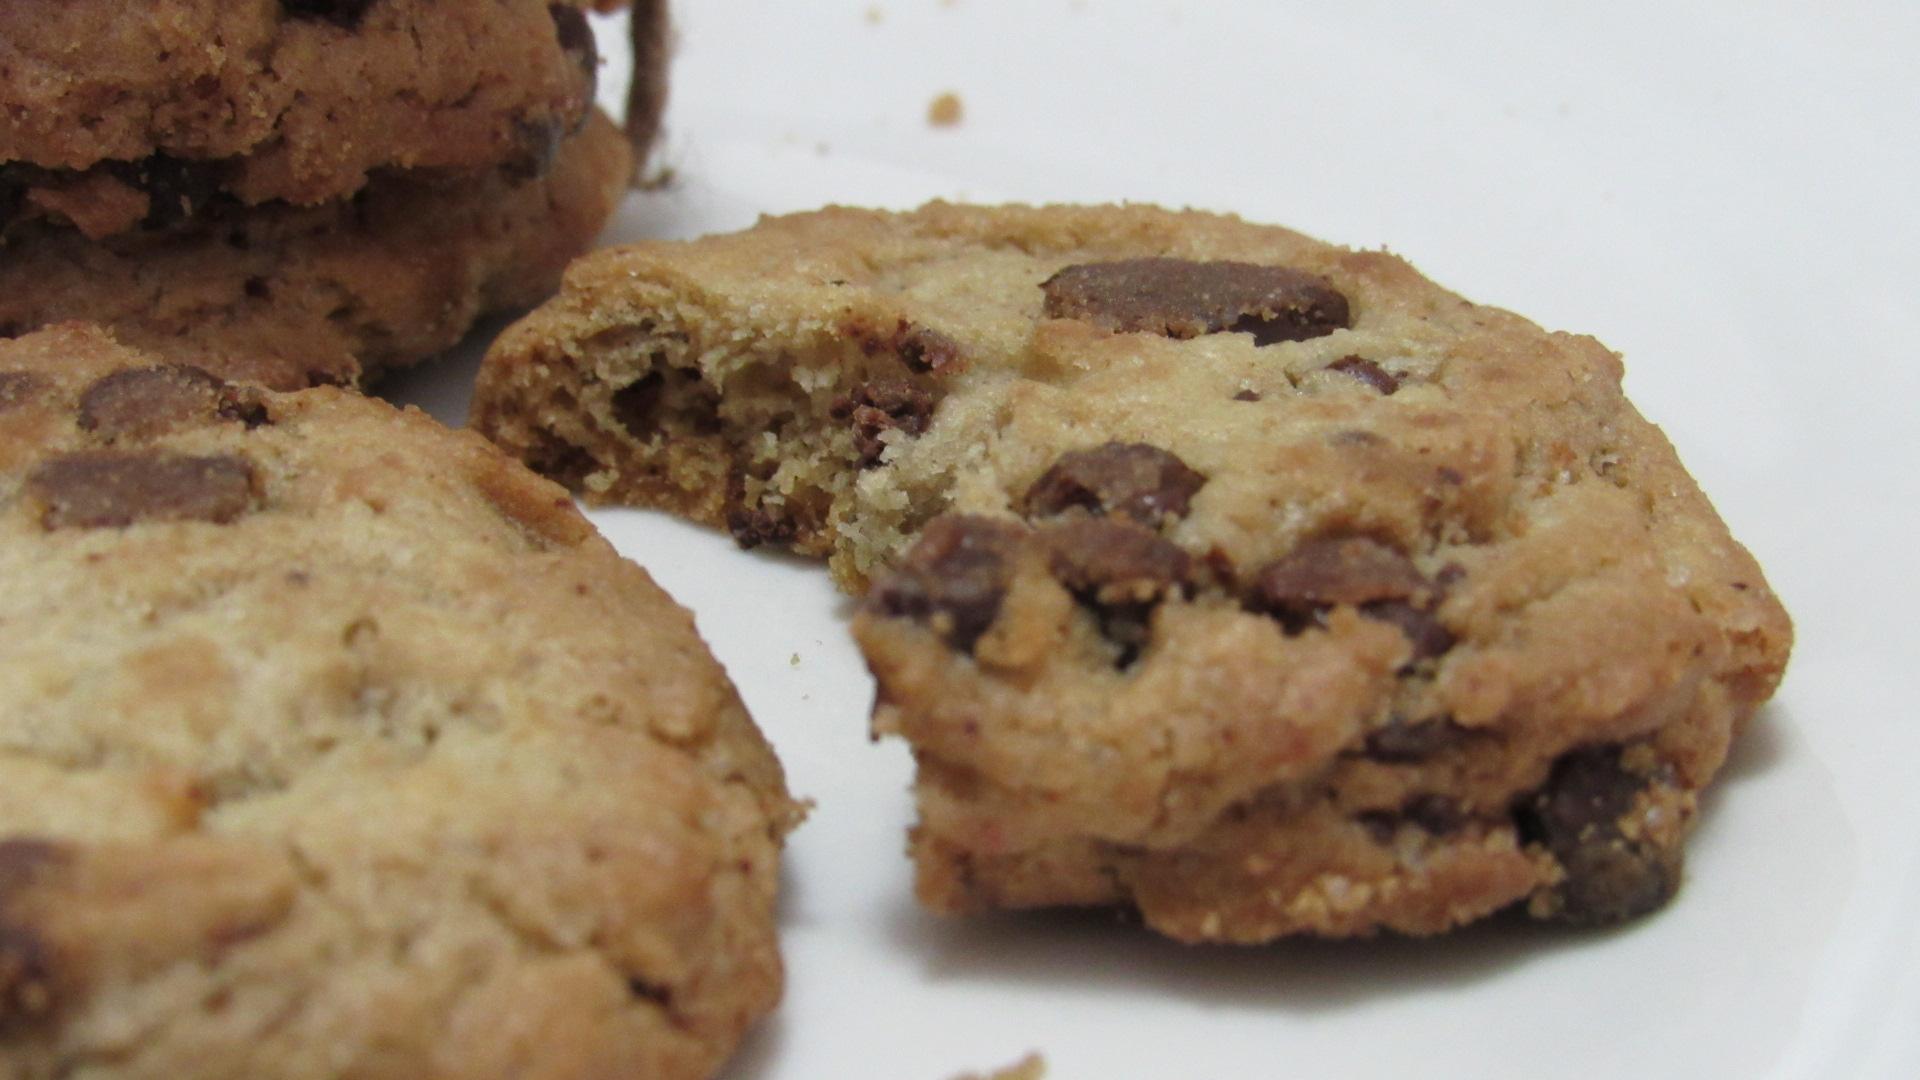 Back To Nature Chocolate Chunk Cookies #momsmeet #glutenfree #ad #cookies